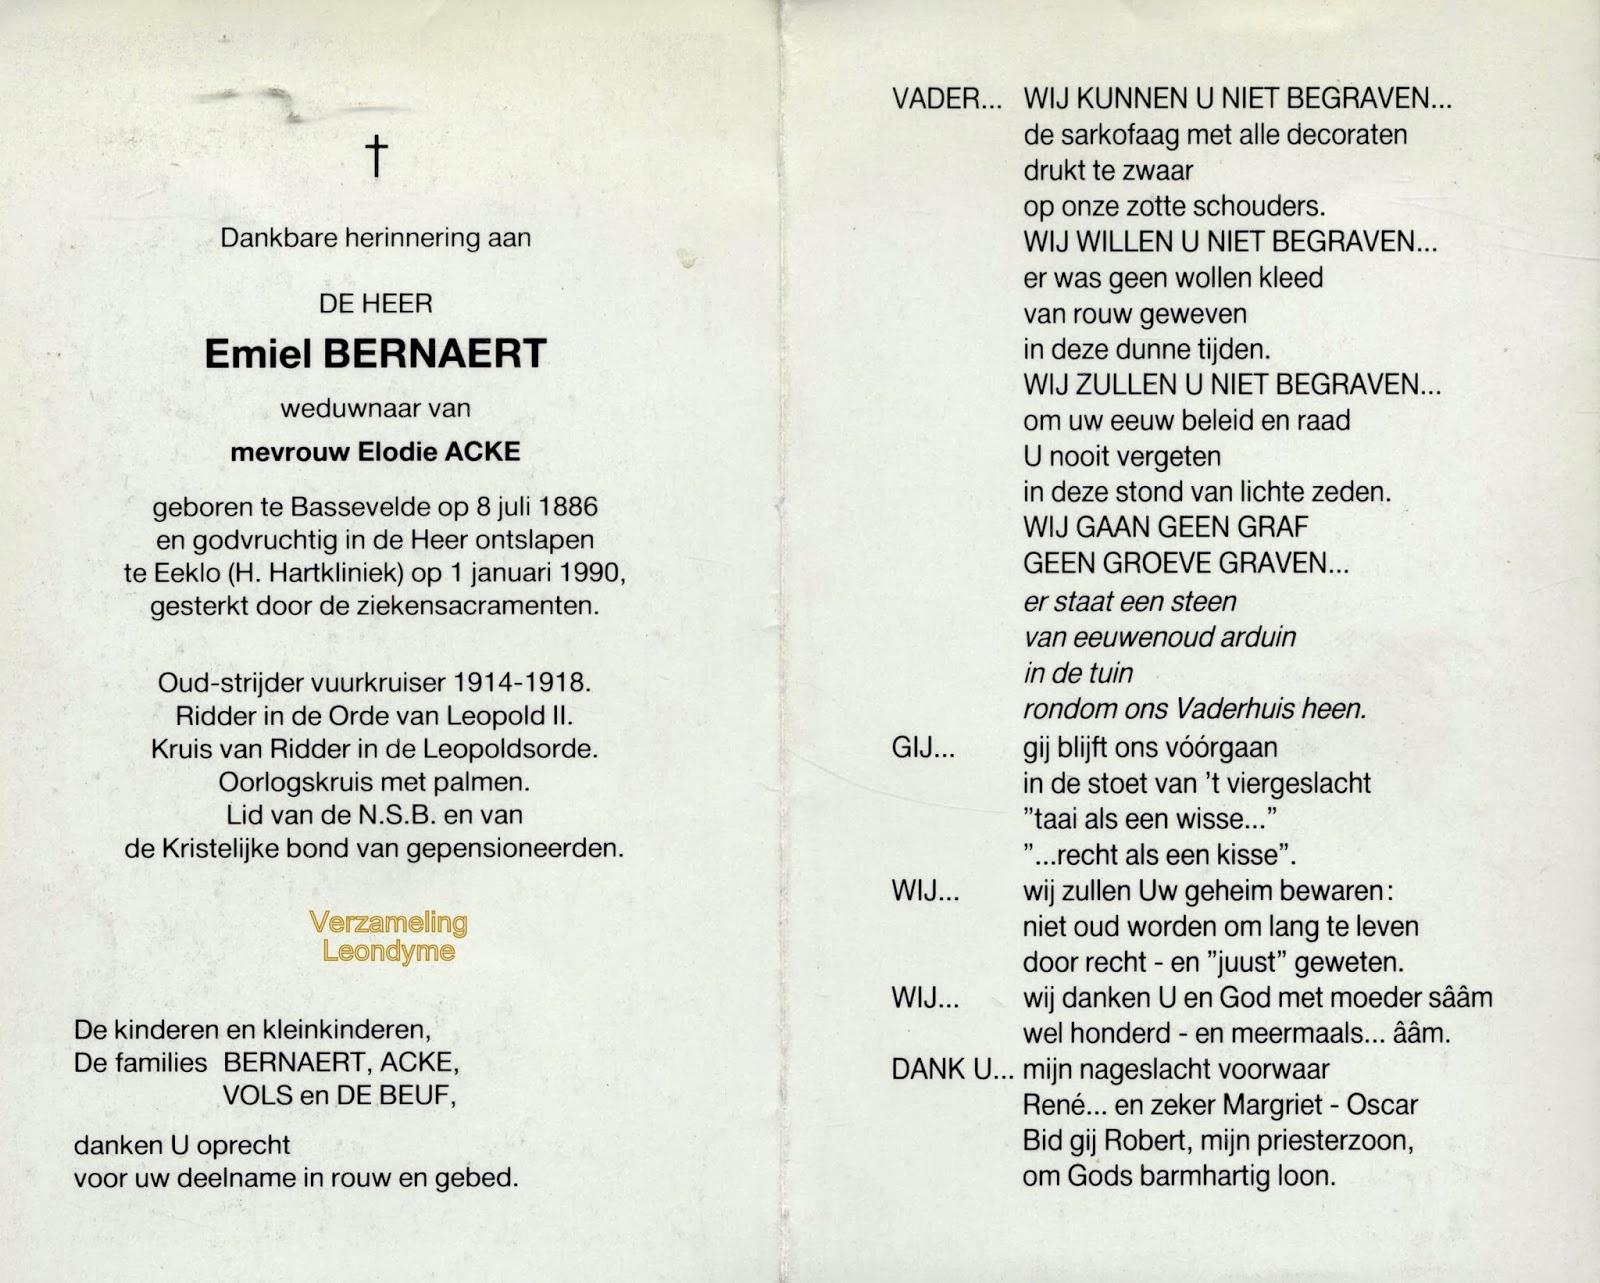 Bidprentje, Emiel Bernaert 1886-1990. Verzameling Leondyme